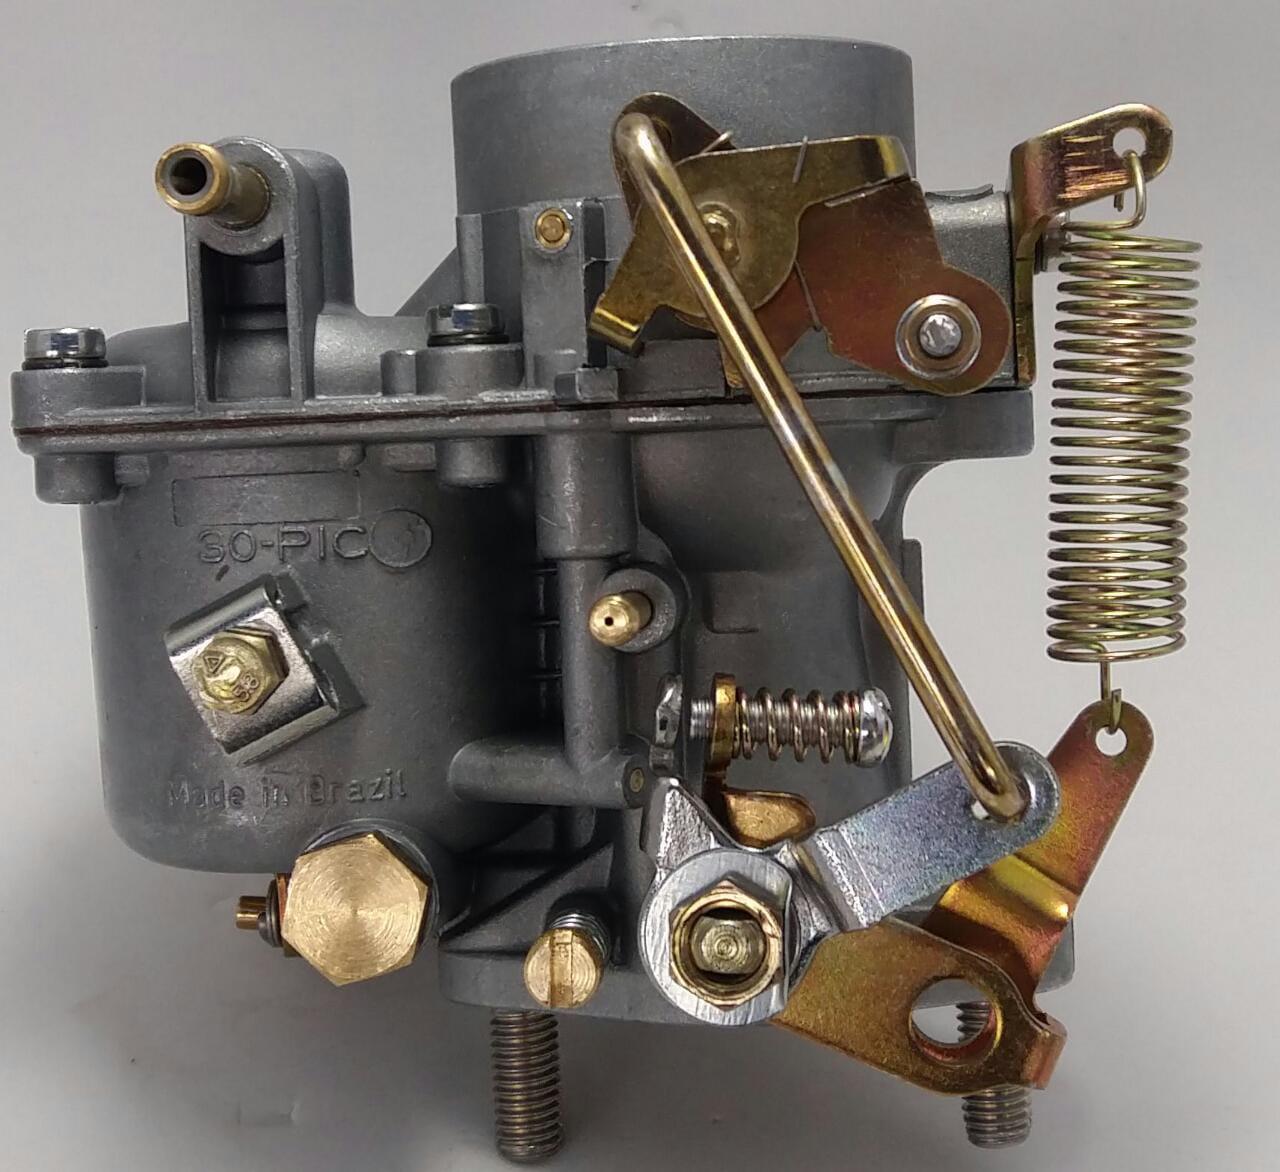 Carburador Novo Fusca Kombi de 1972/83 brasilia de 1973 1974/75